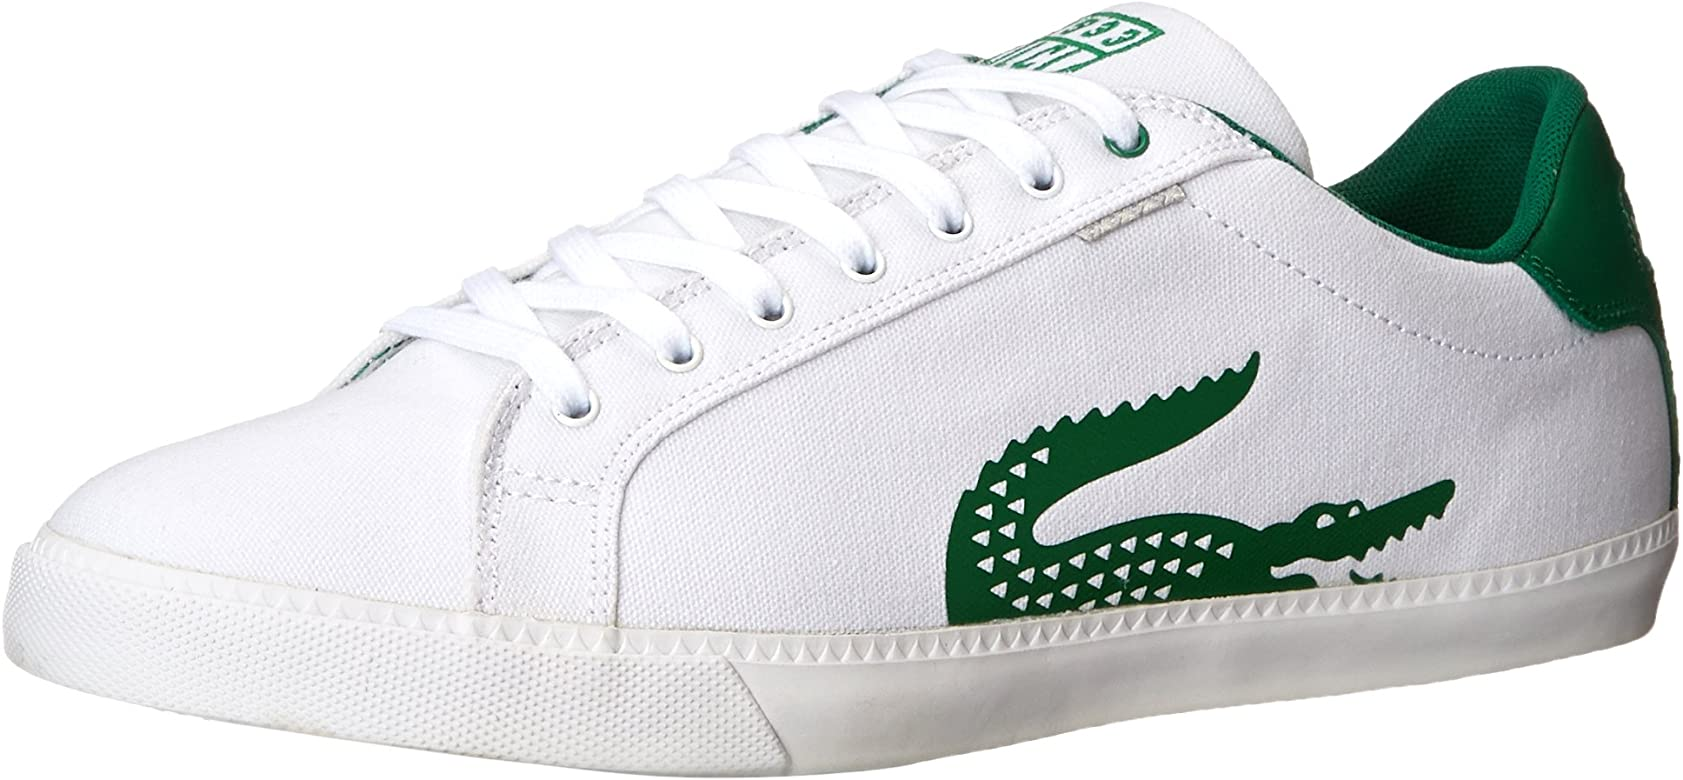 7508cd1d56c7 Lacoste Men s Grad Vulc Fashion Sneaker